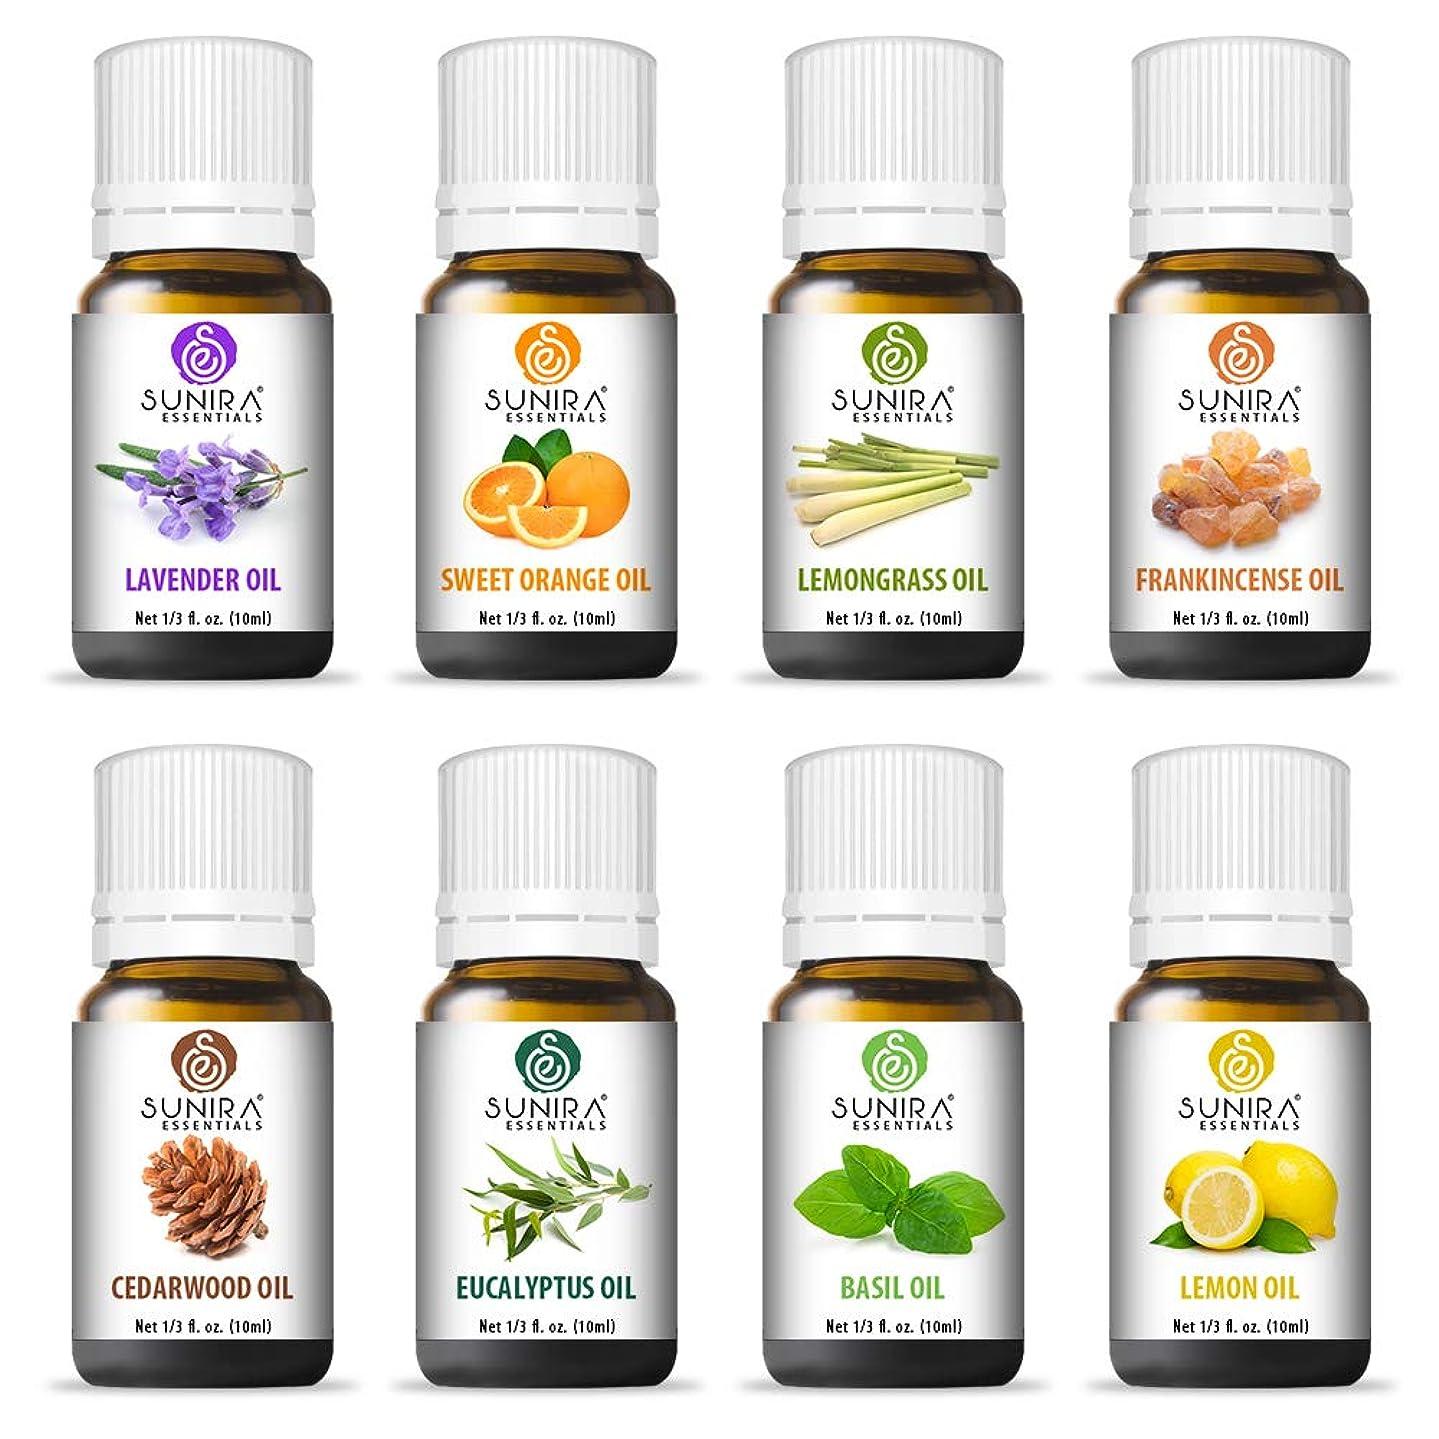 Sunira Essential Oil Set - Top 08, Therapeutic Grade, 100% Pure Essential Oils (Lavender, Basil, Lemon, Eucalyptus, Frankincense, Lemongrass,Cedar wood & Orange)